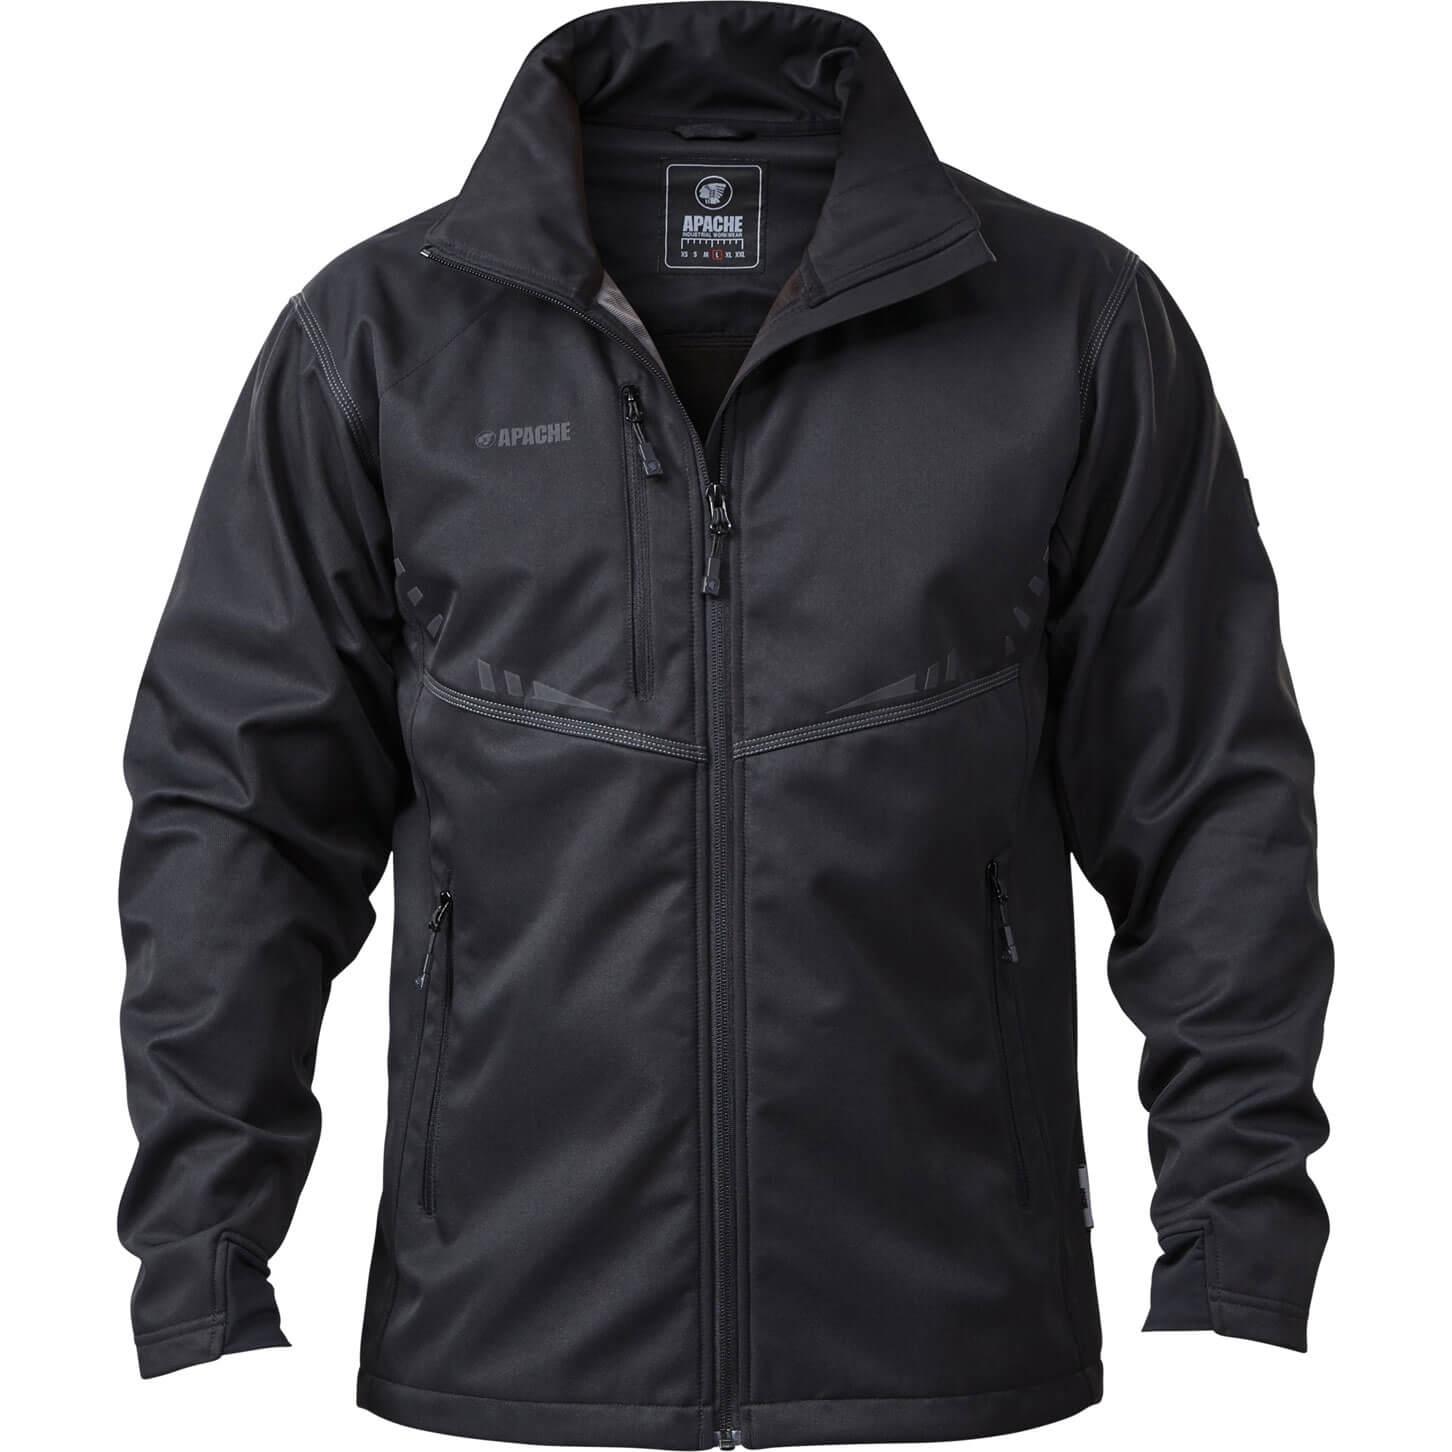 Image of Apache ATS Lightweight Soft Shell Jacket Black XL